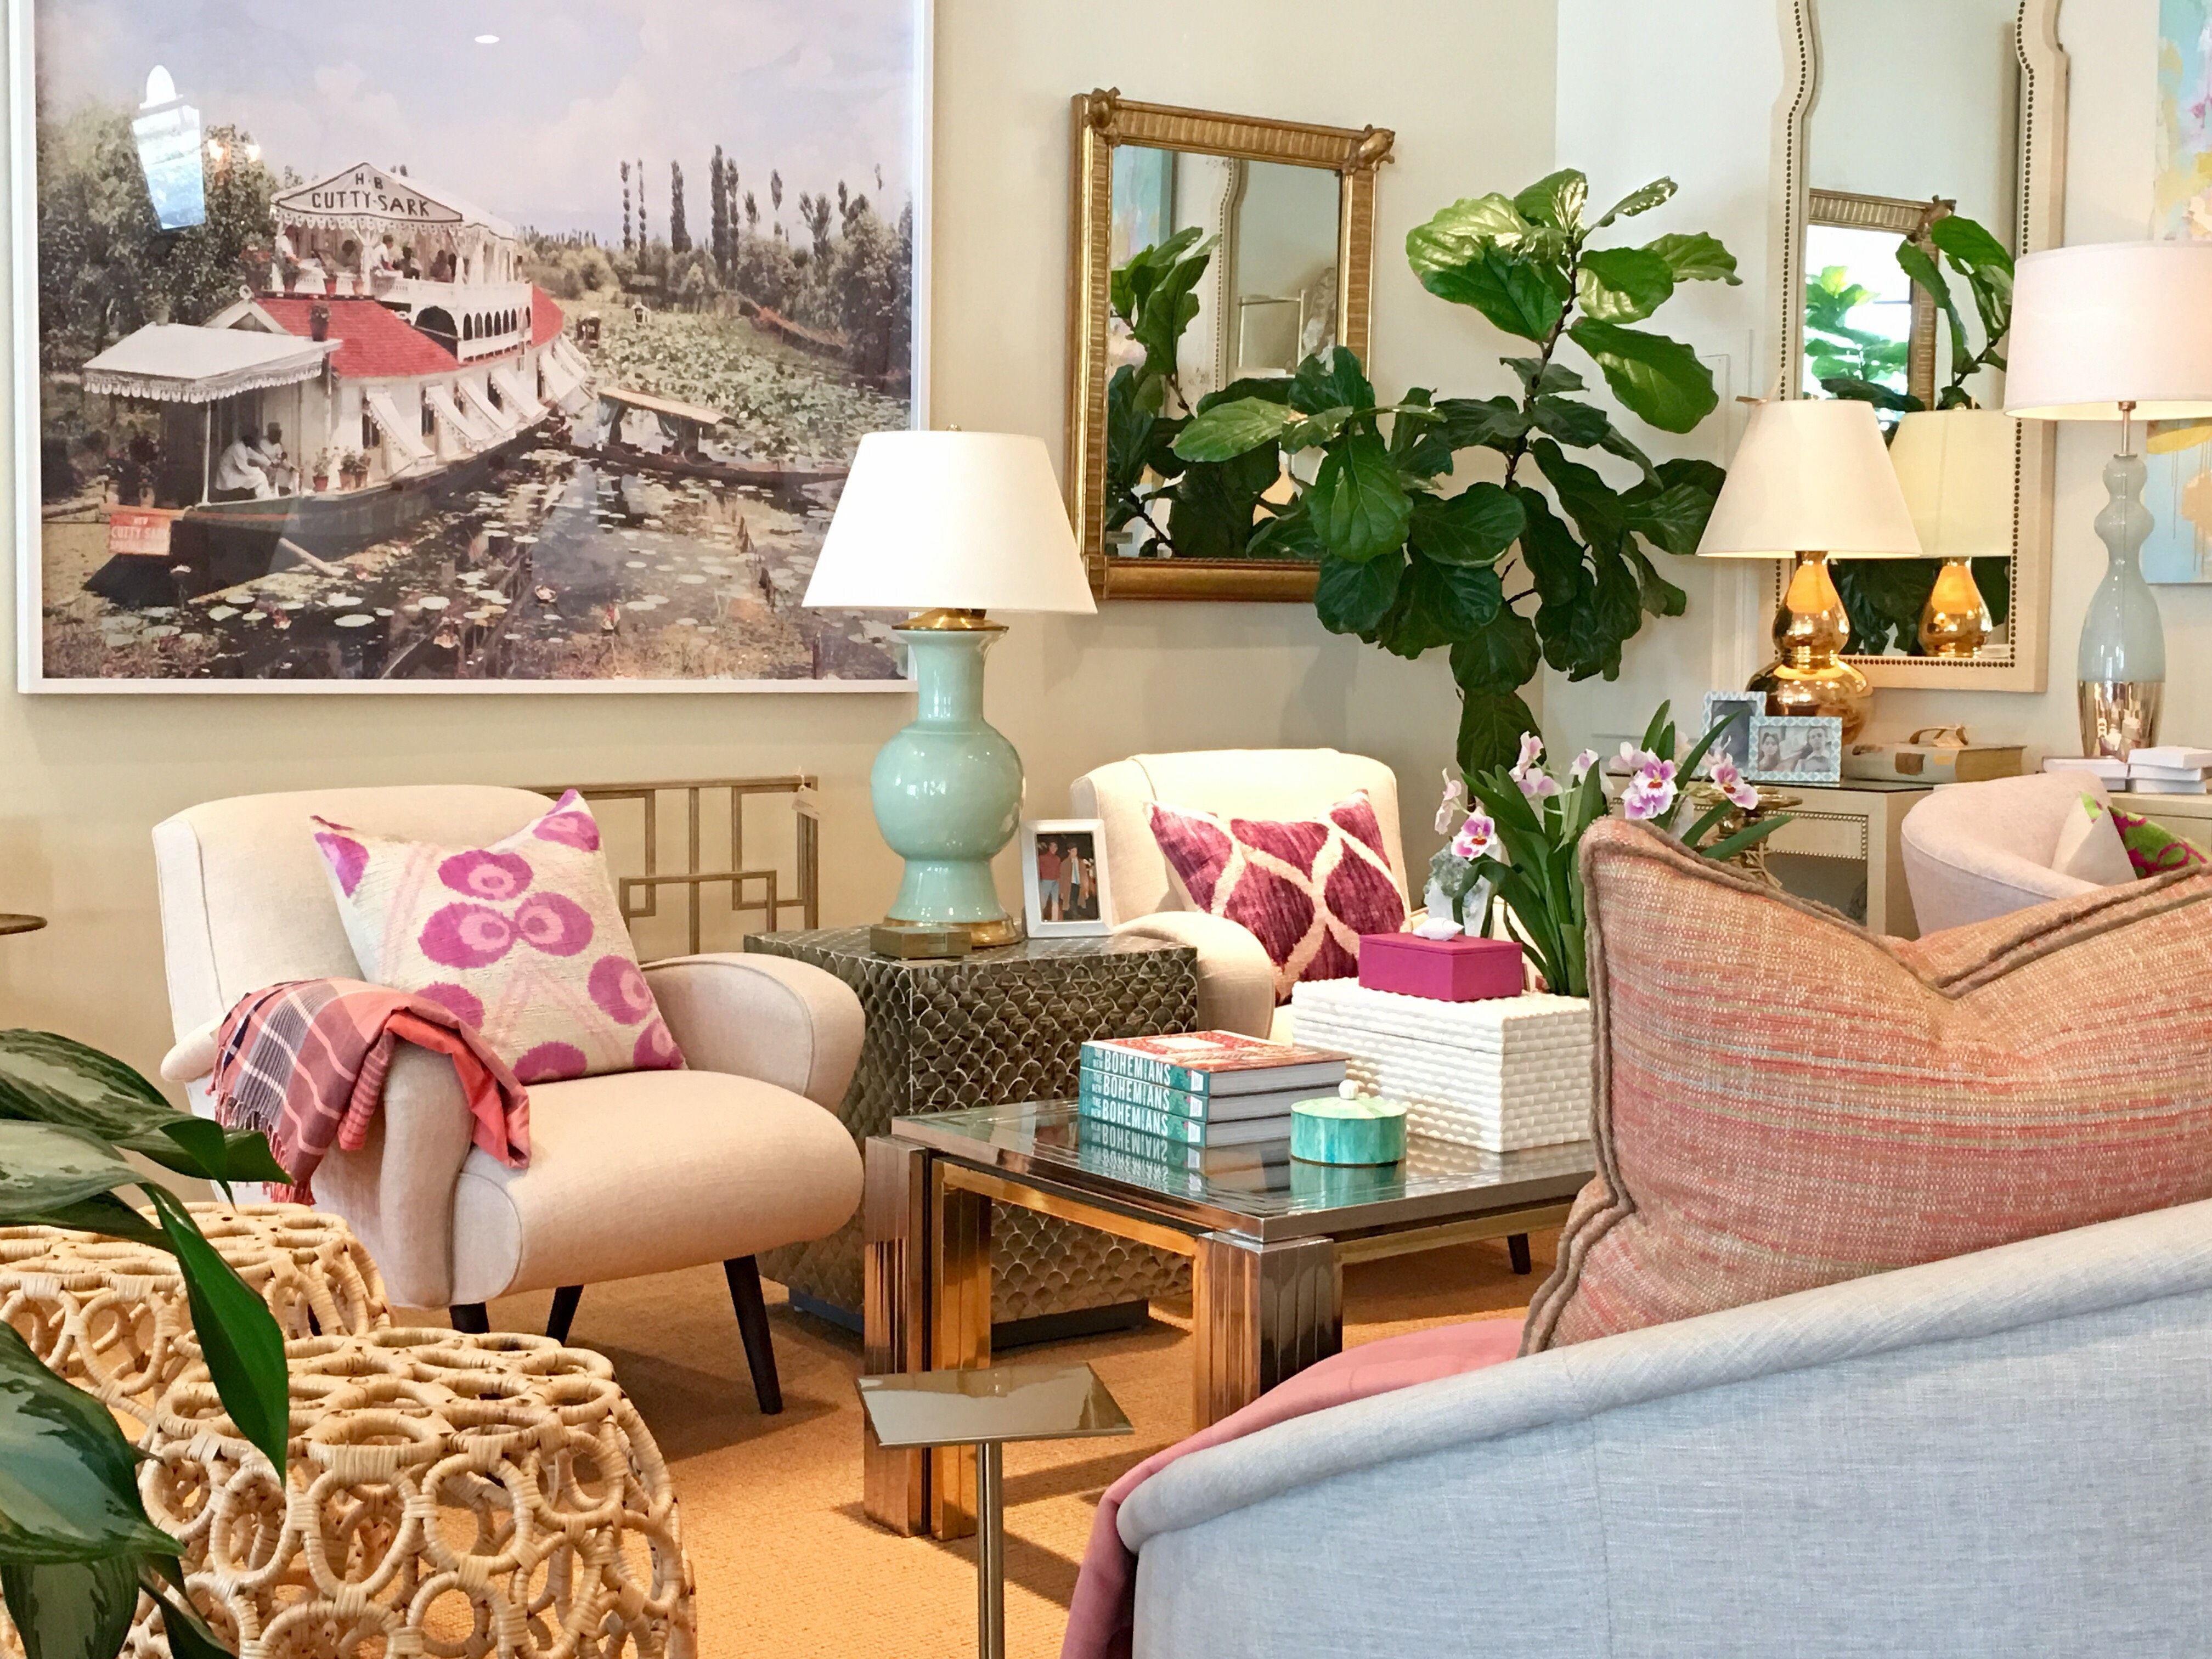 Mint and magenta spring hues at Mecox Dallas #interiordesign #home #decor #design